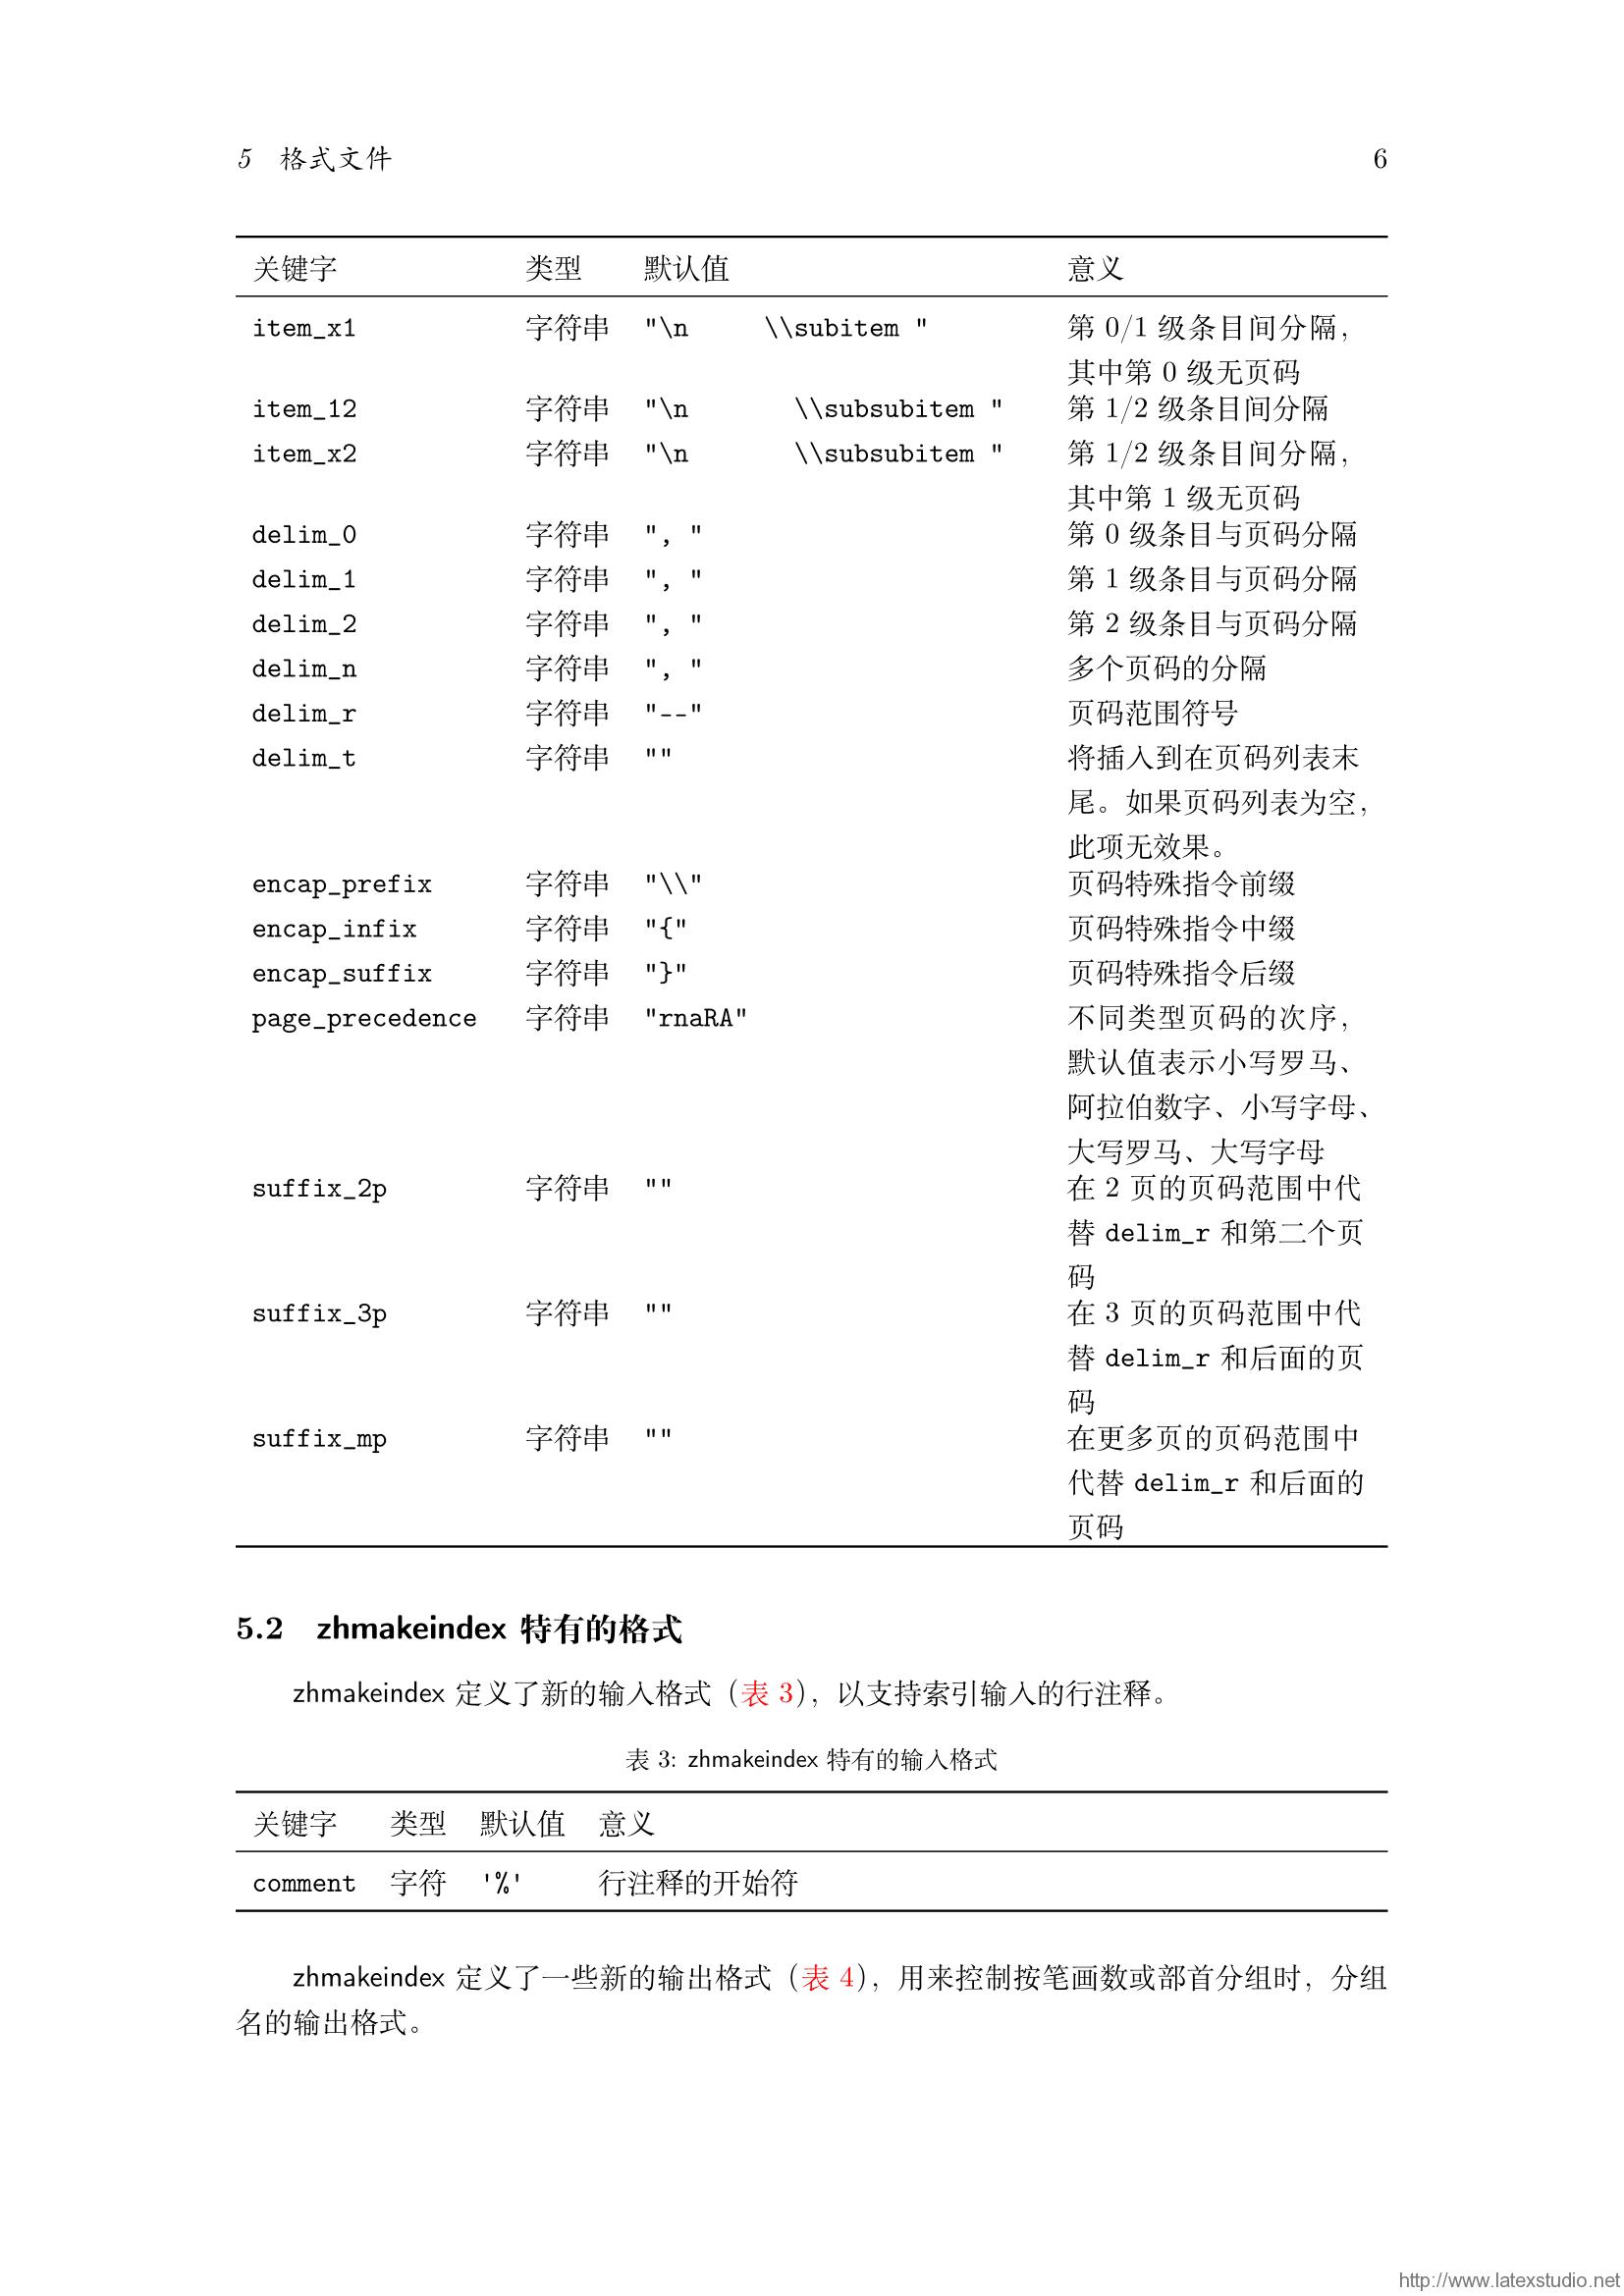 zhmakeindex-06